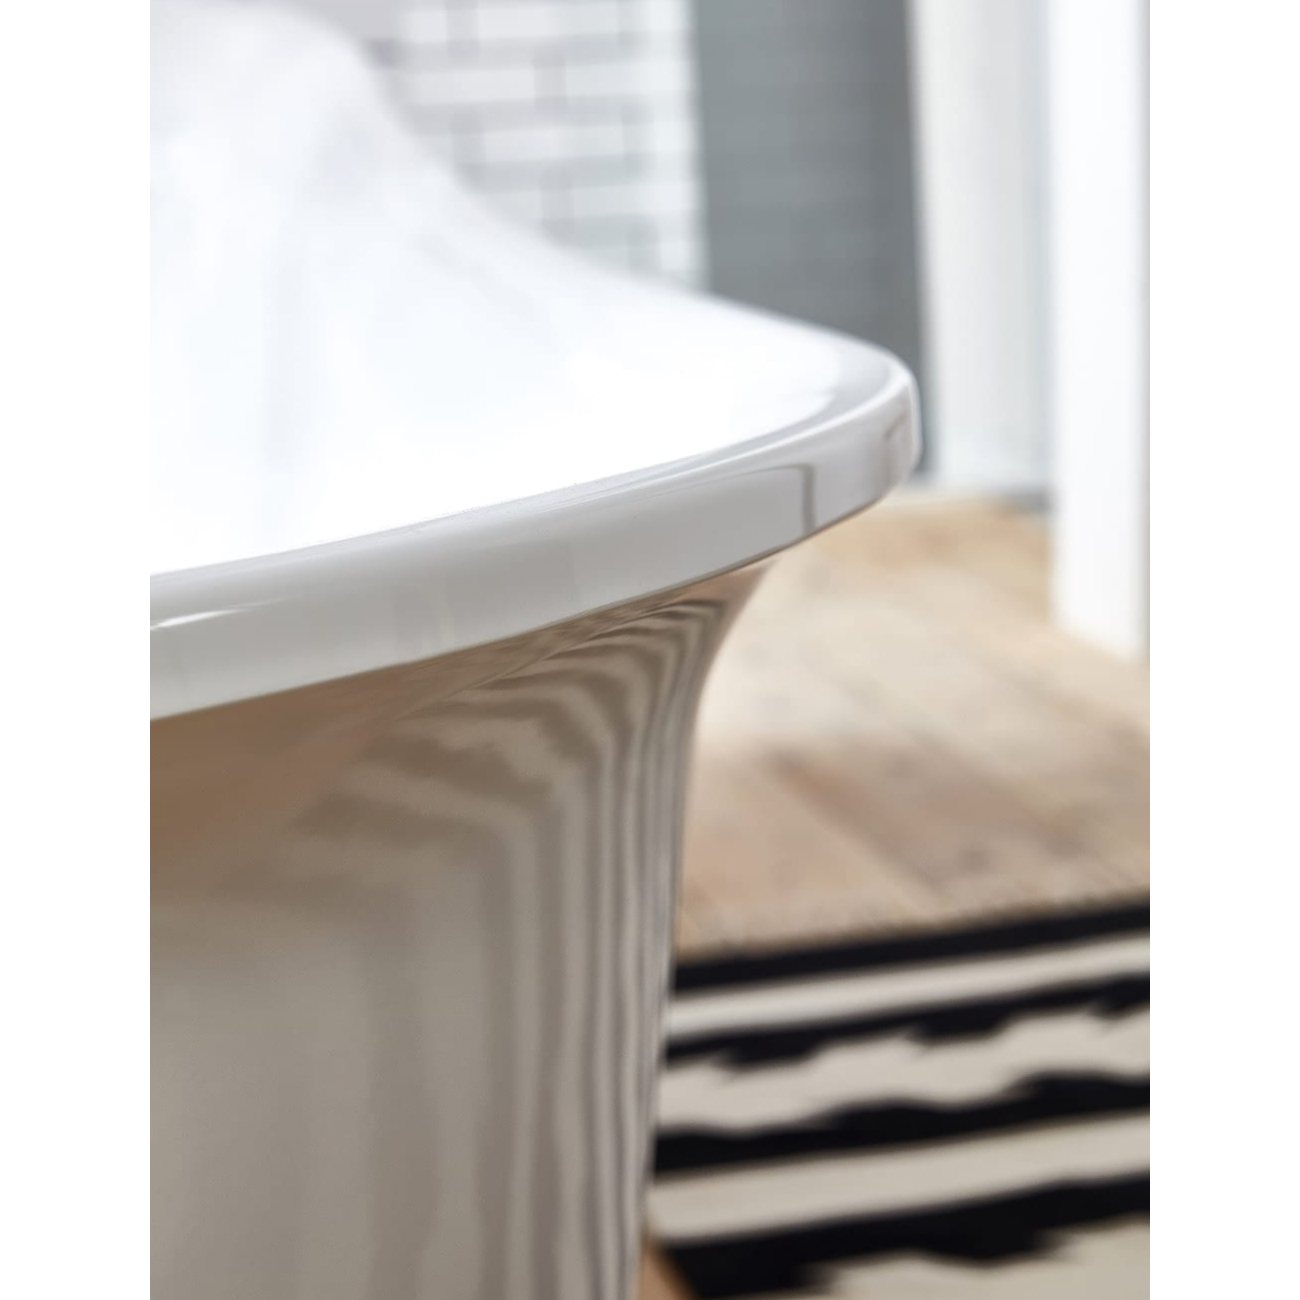 Verona Belmont Freestanding Slipper Bath with Chrome Ball Feet 1520mm x 710mm - White